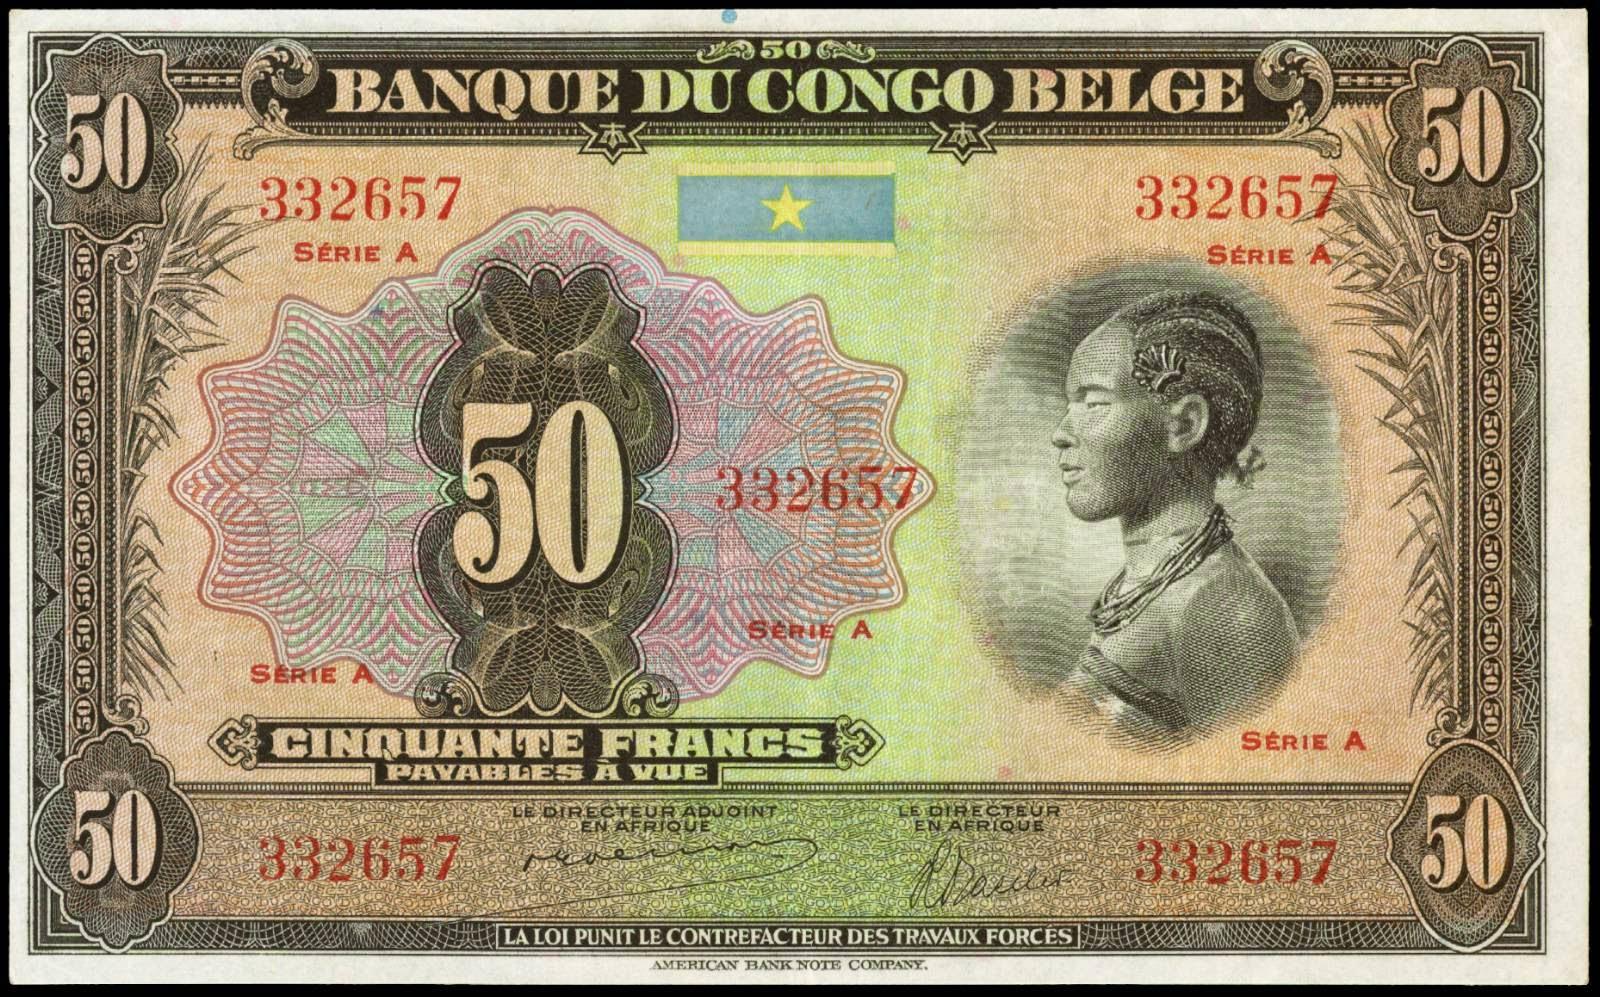 Belgian Congo 50 Francs banknote African woman